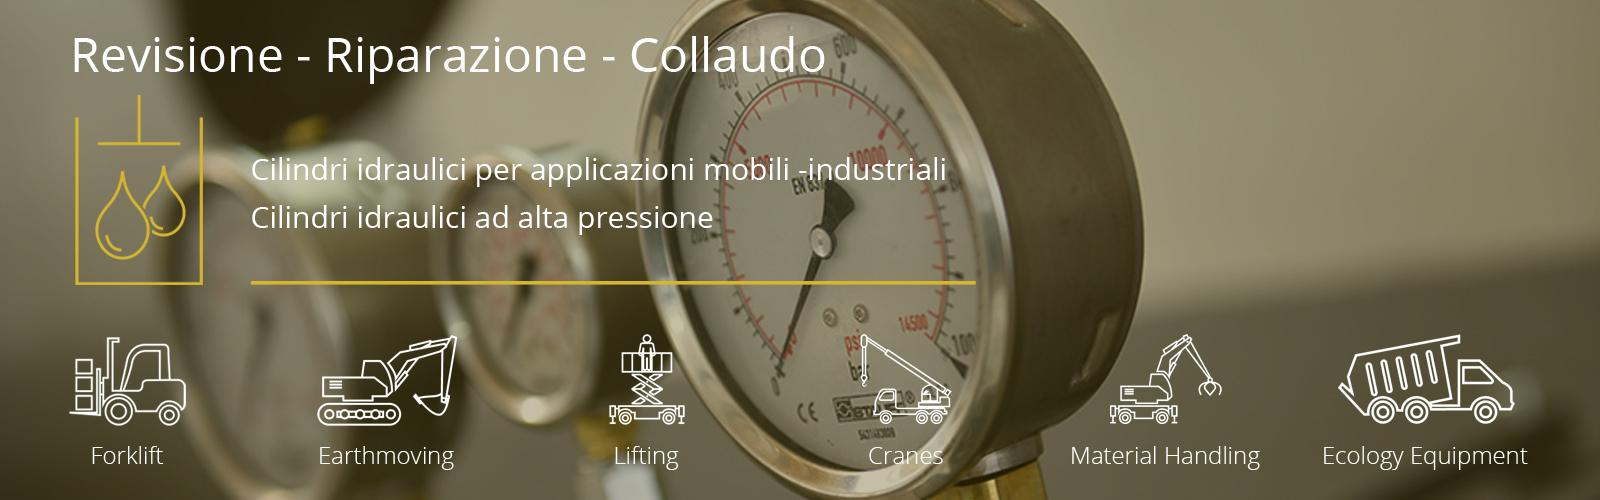 http://www.moromeccanica.it/wp-content/uploads/2015/01/slide_olio.jpg